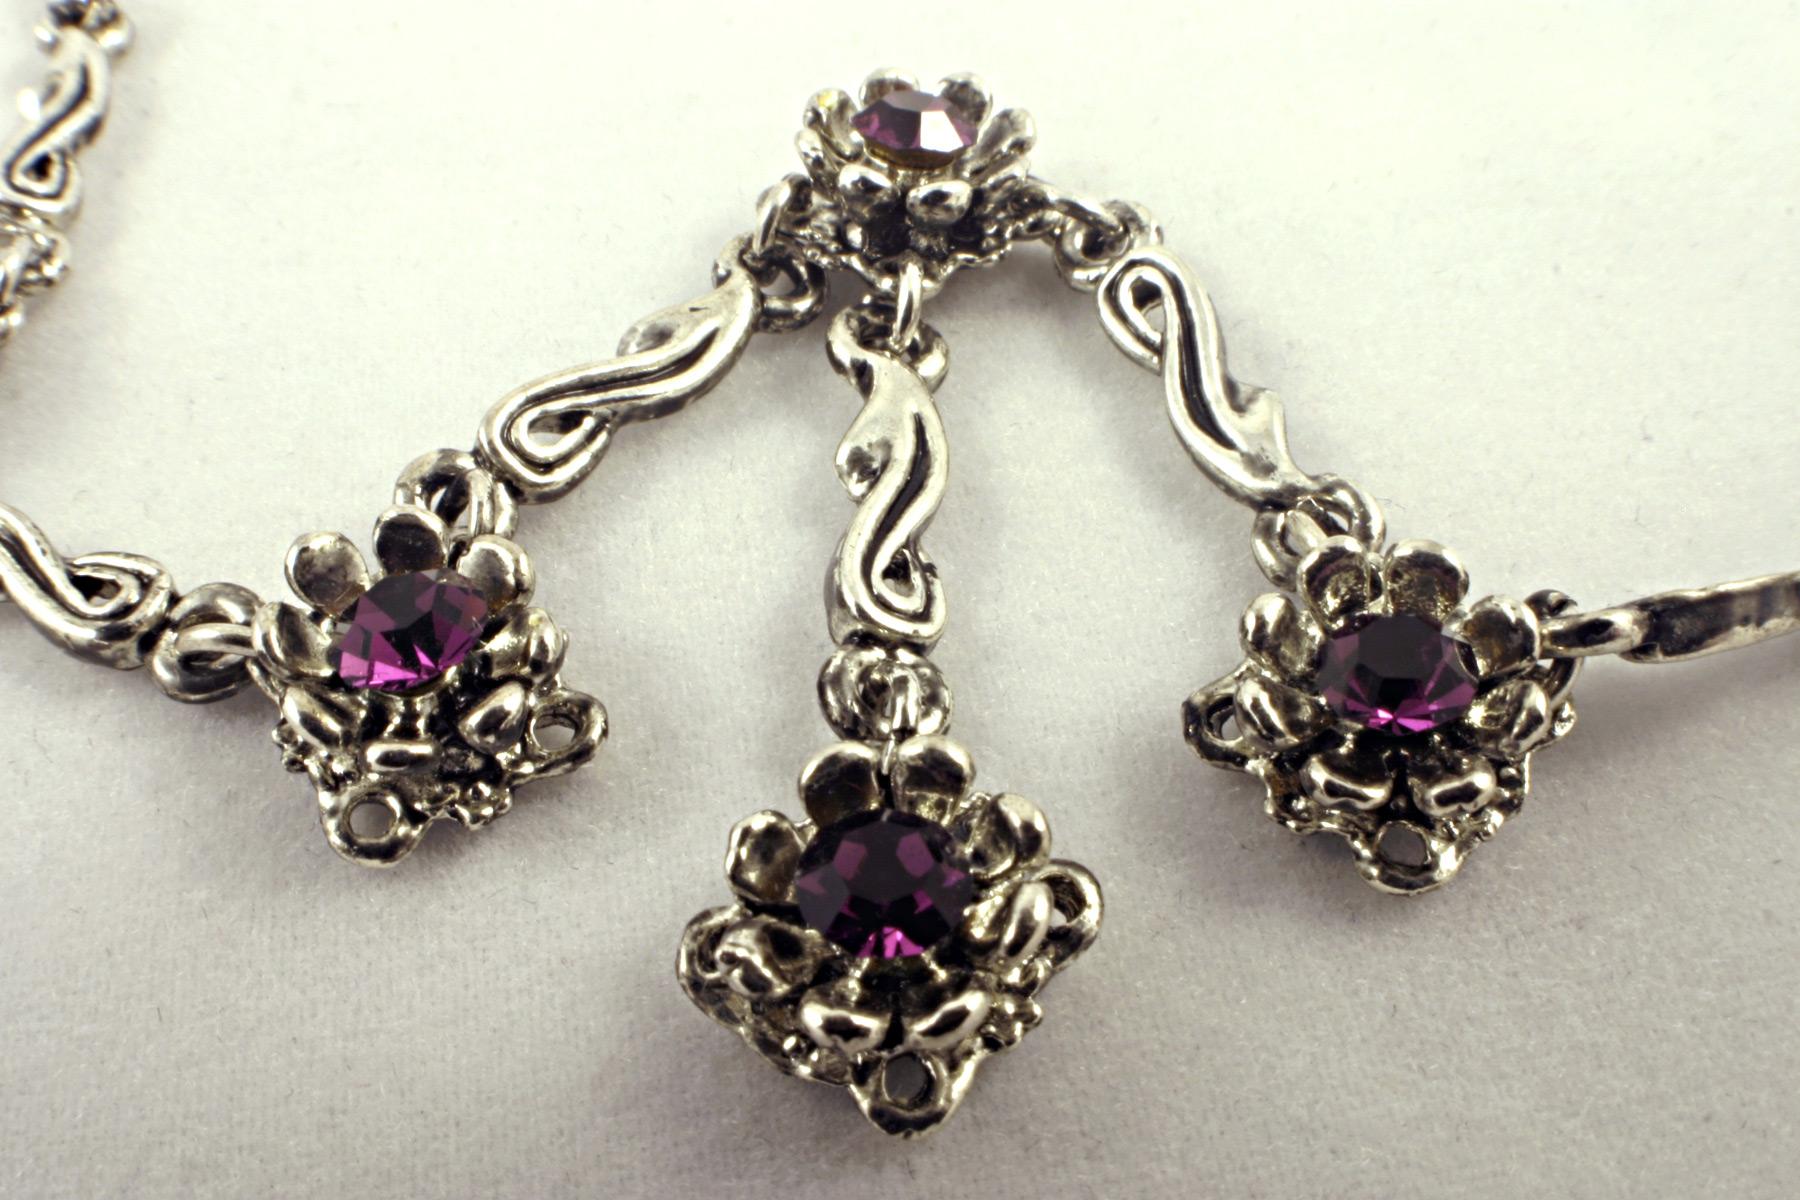 Diamond necklace photo